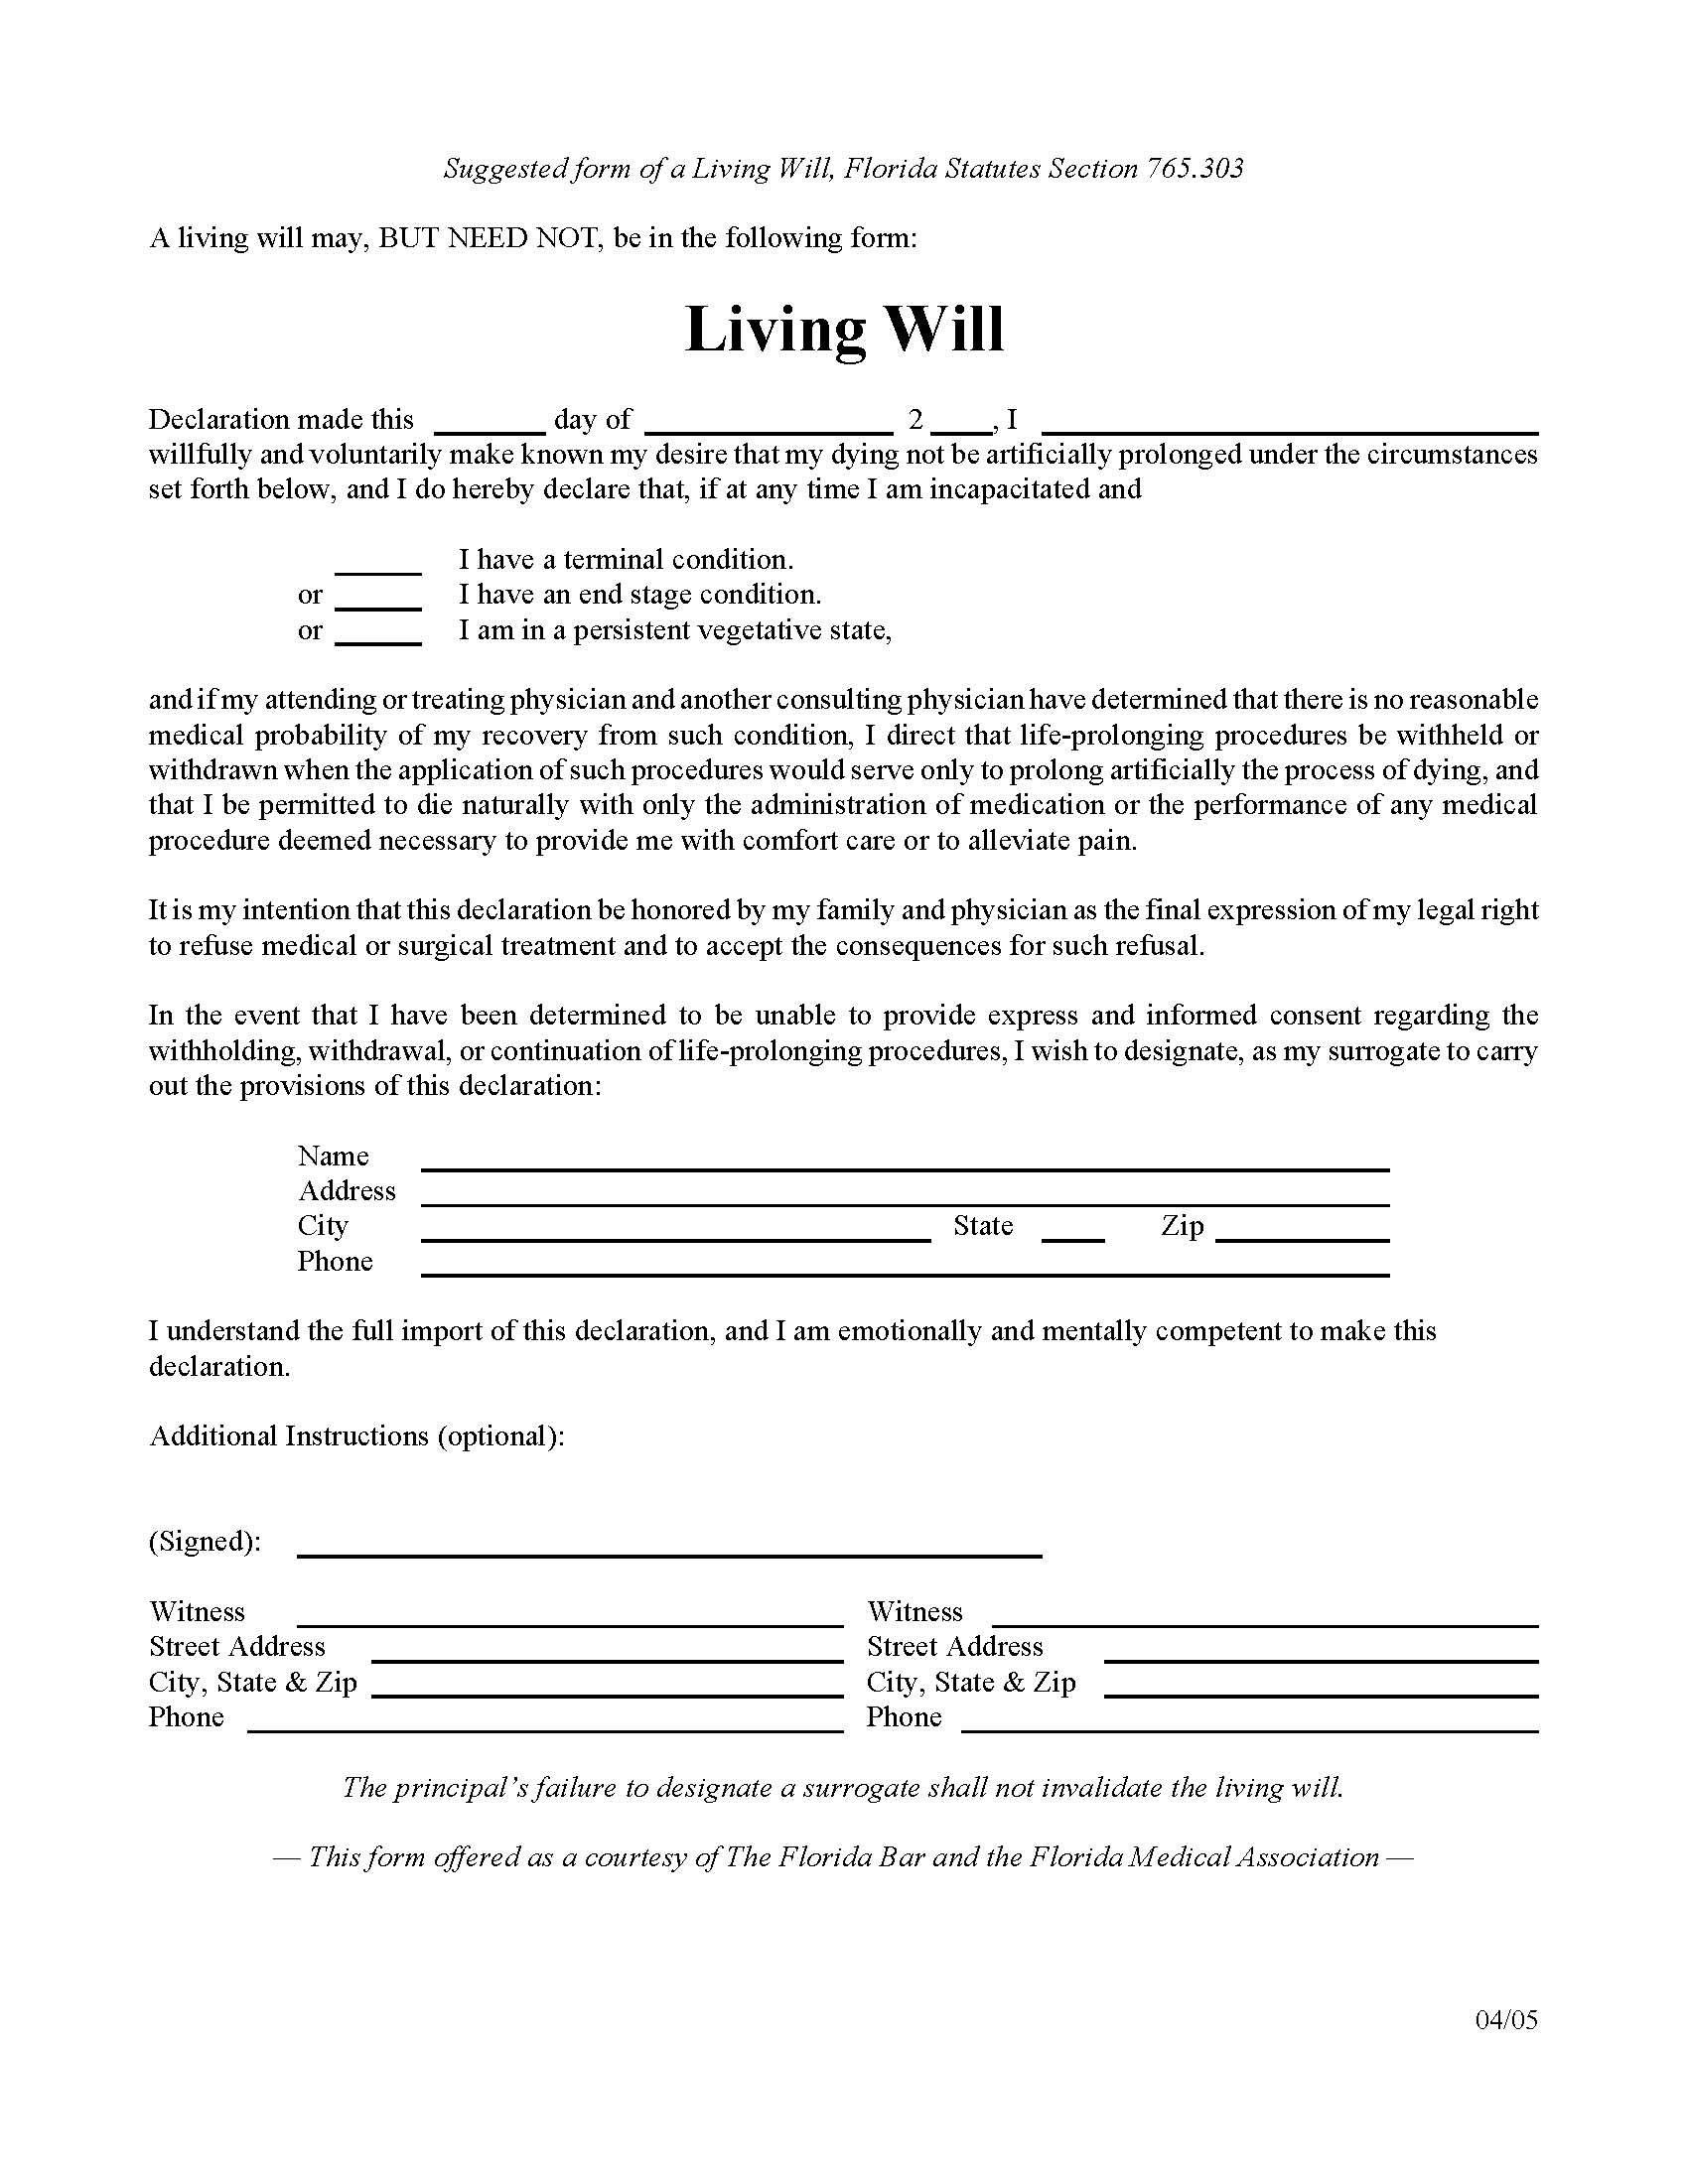 Florida Living Will Sample